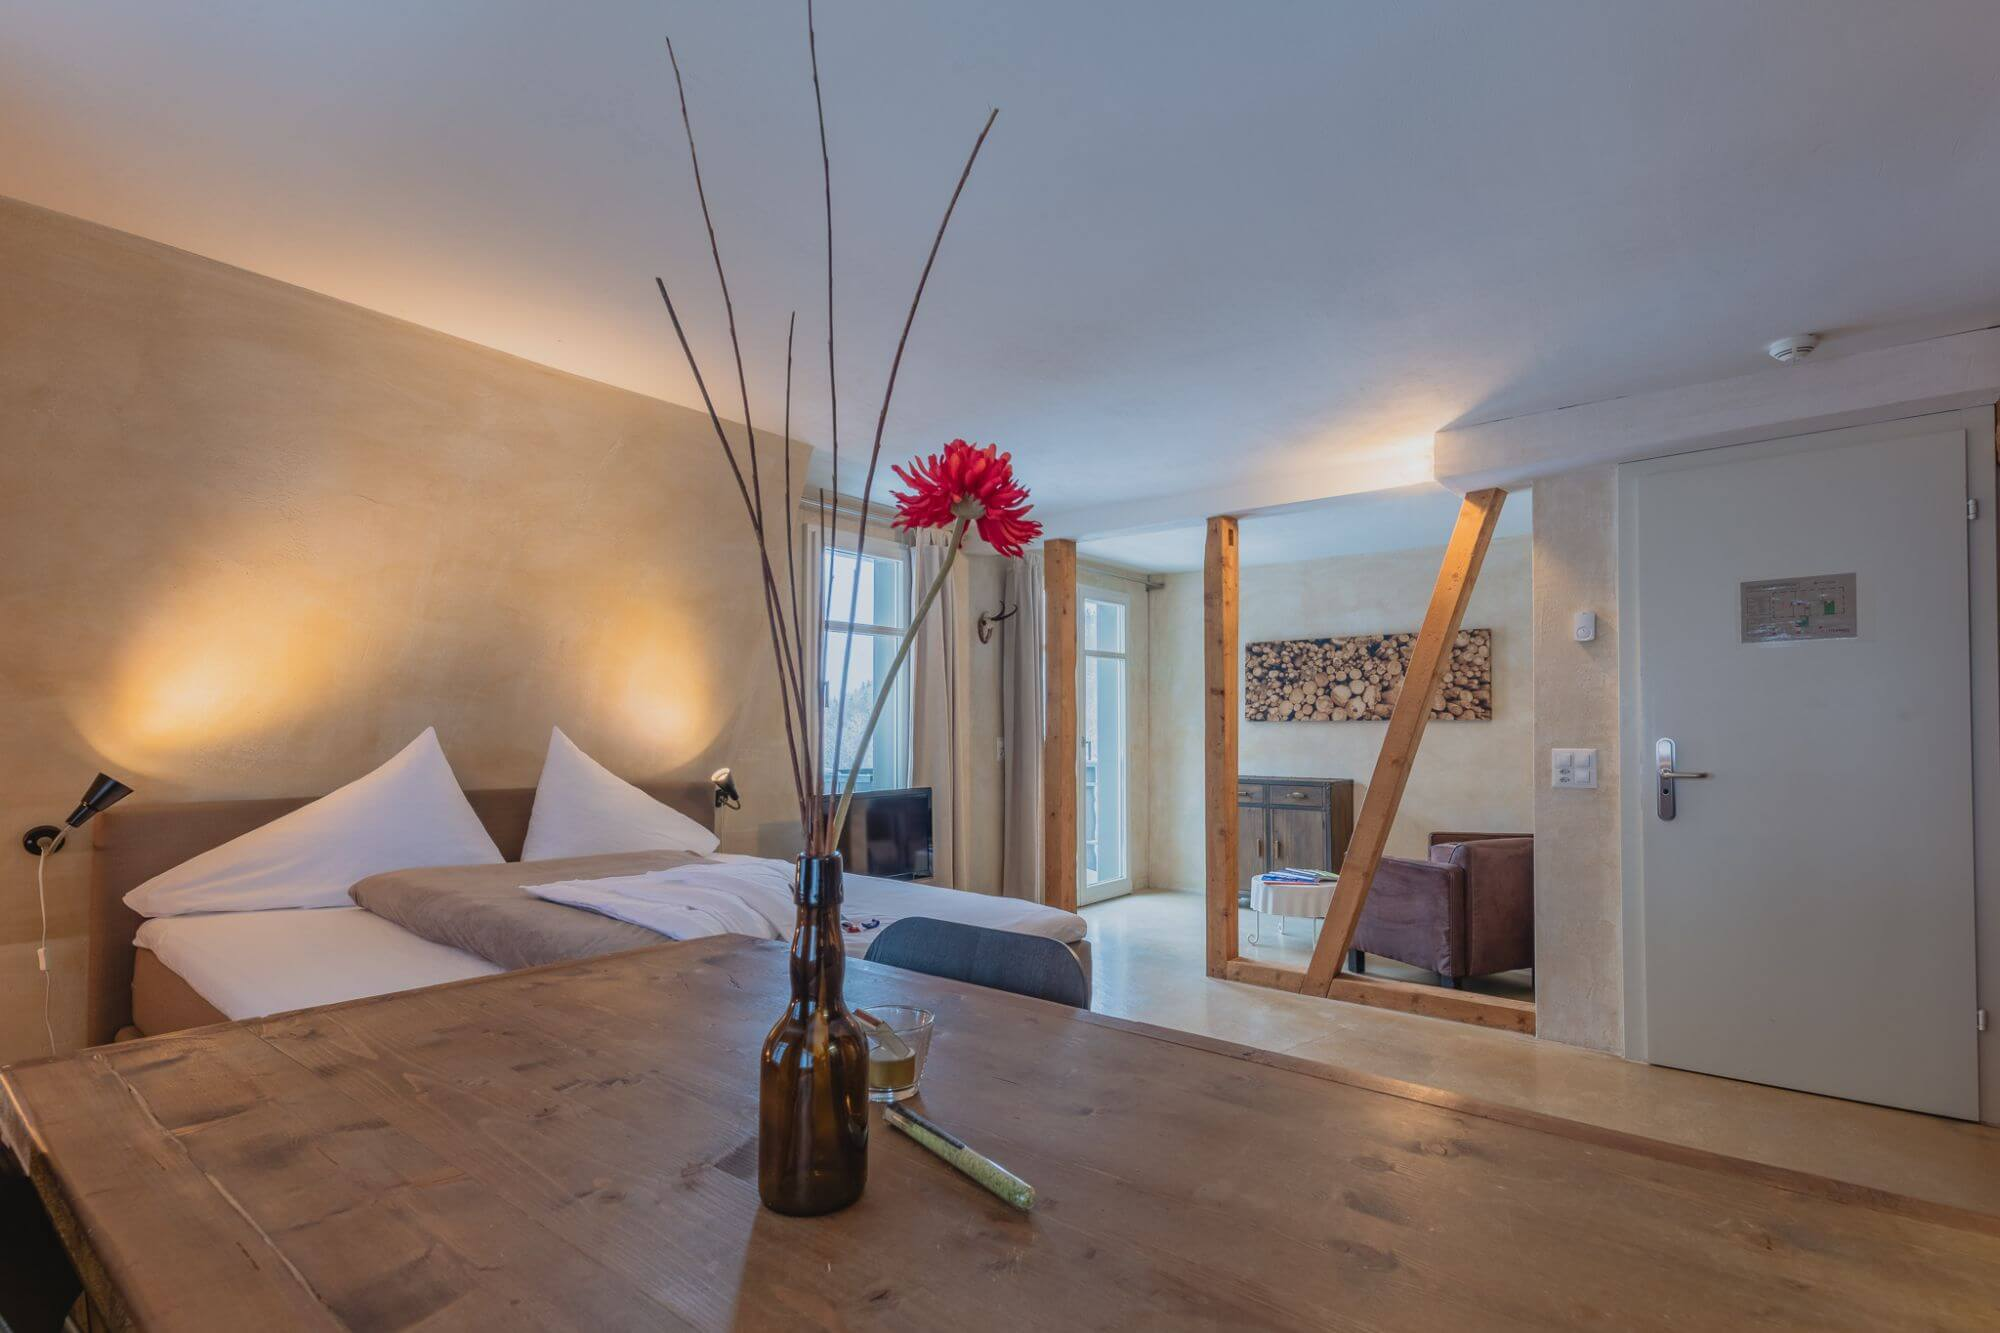 3-tage-im-hotel-wetterhorn-in-hasliberg